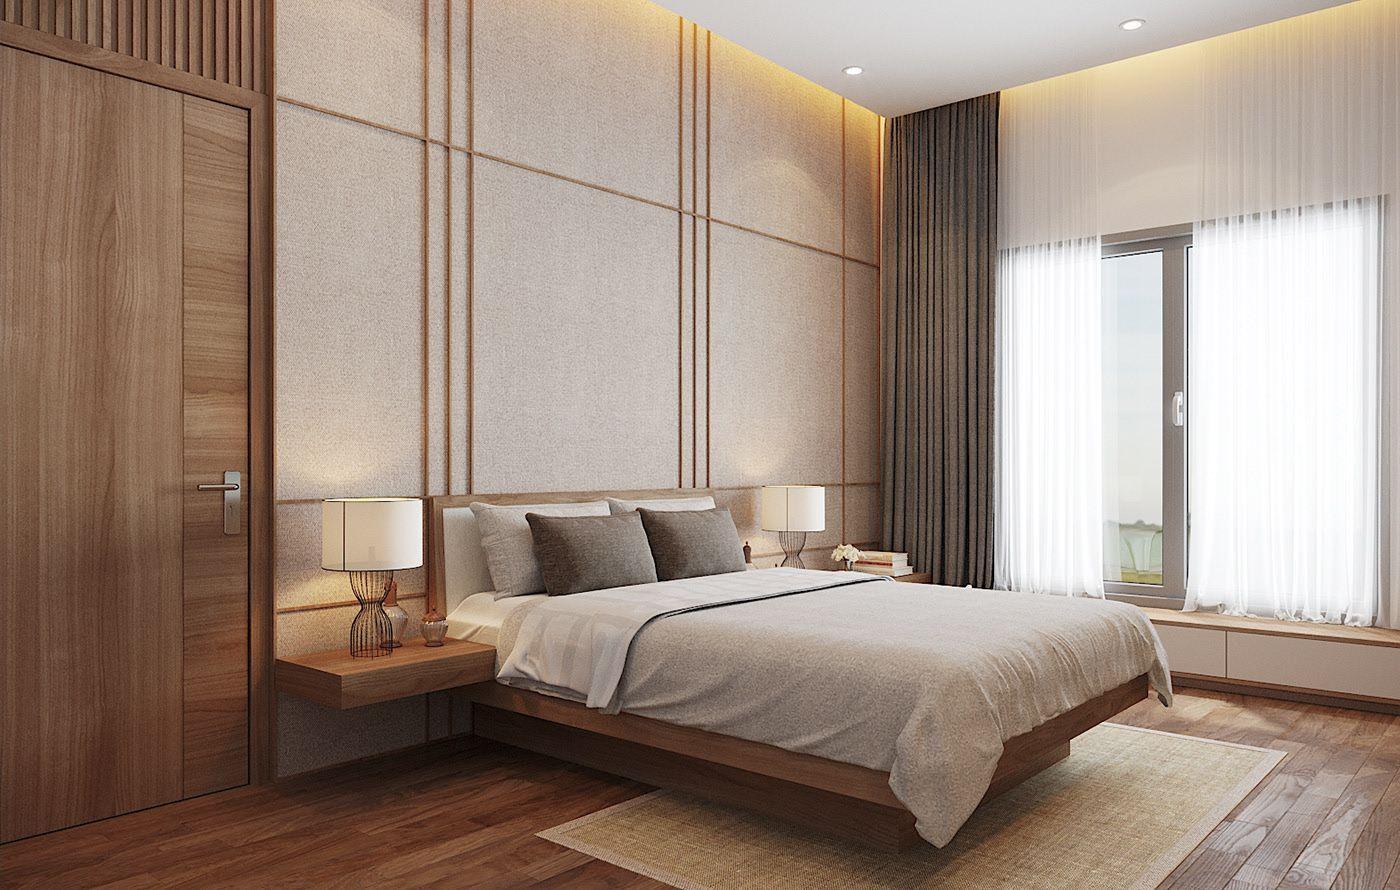 Traditional decor  #japanese #interior #design #modern #bedroom japanese interio... #Bedroom #décor #DESIGN #interio #Interior #japanese #Modern